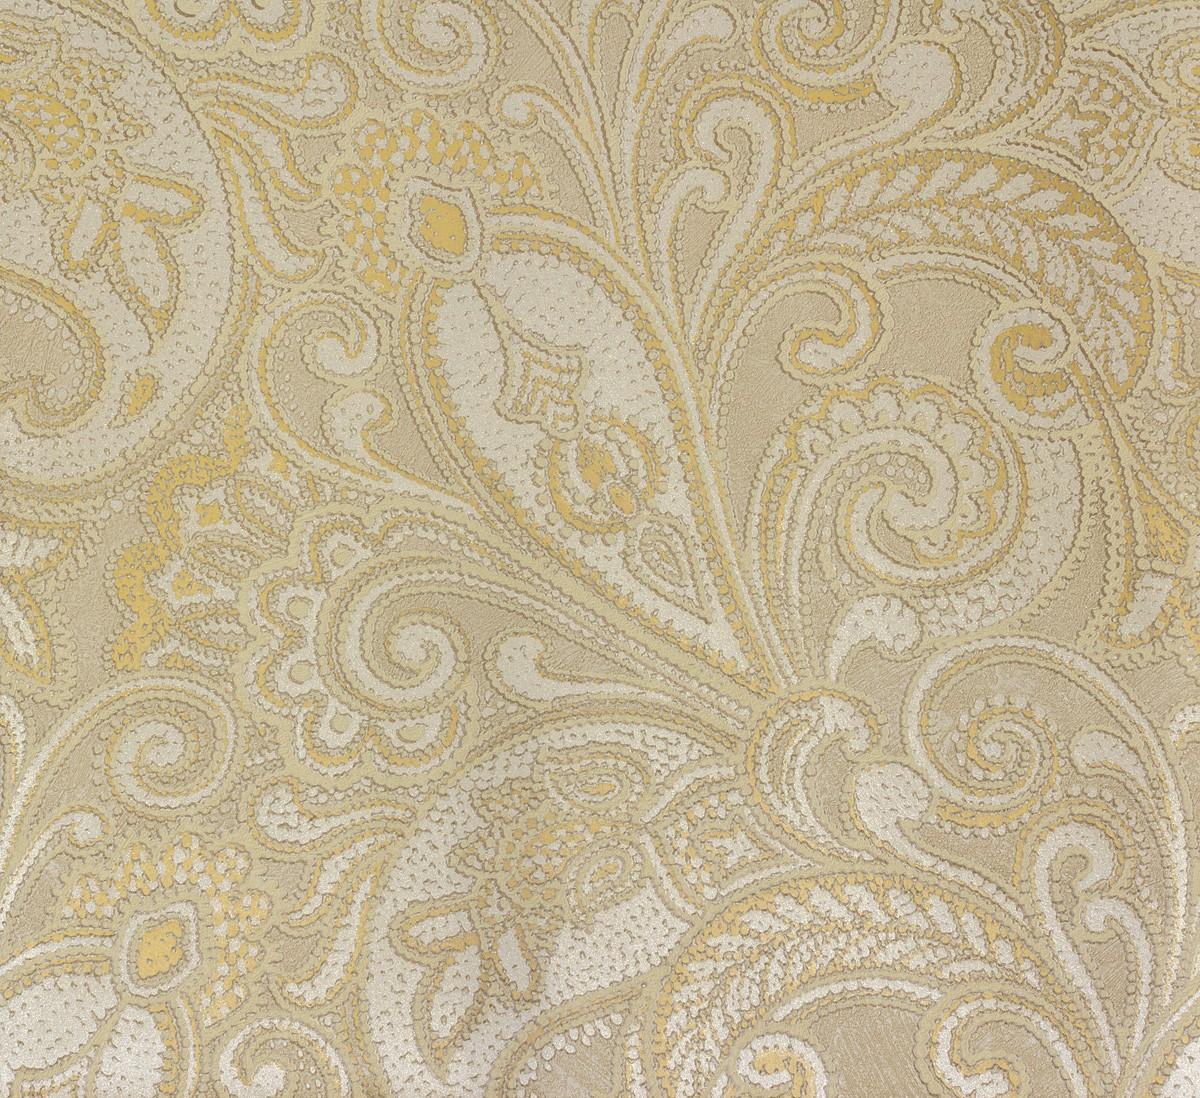 tapete vlies barock creme gold marburg light story glamour. Black Bedroom Furniture Sets. Home Design Ideas